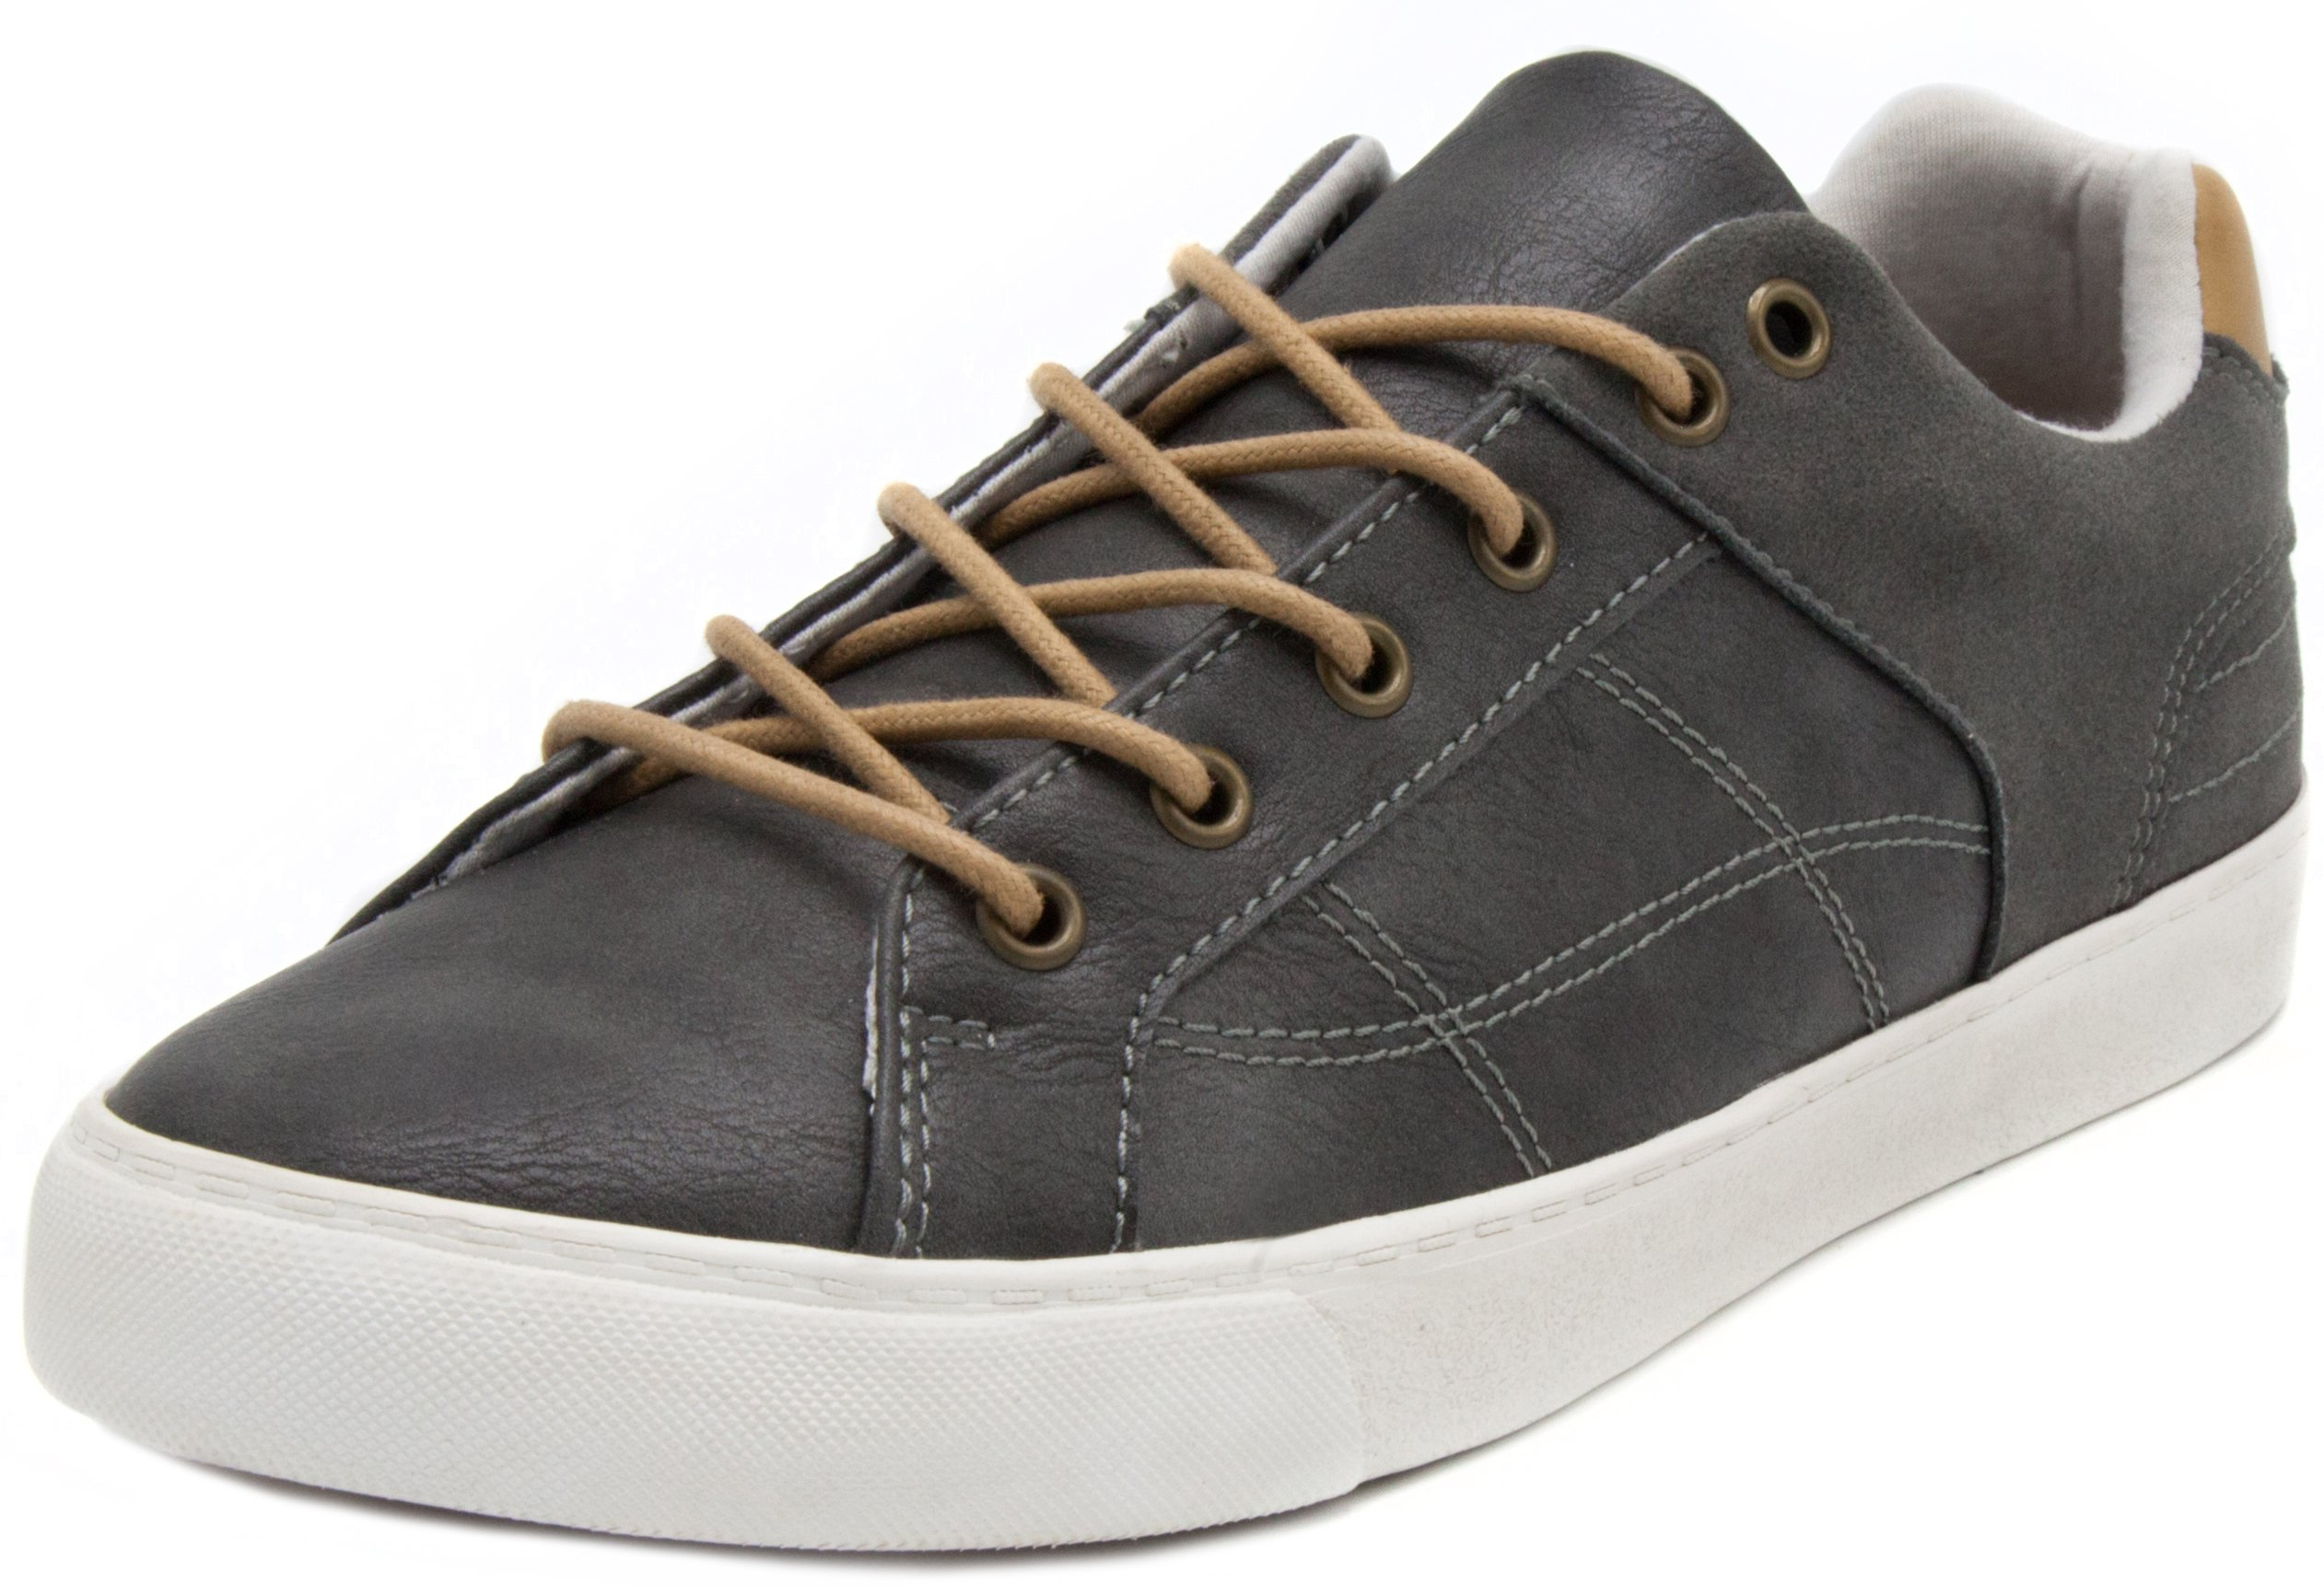 London Fog Mens Nottingham Fashion Sneaker Grey 10.5